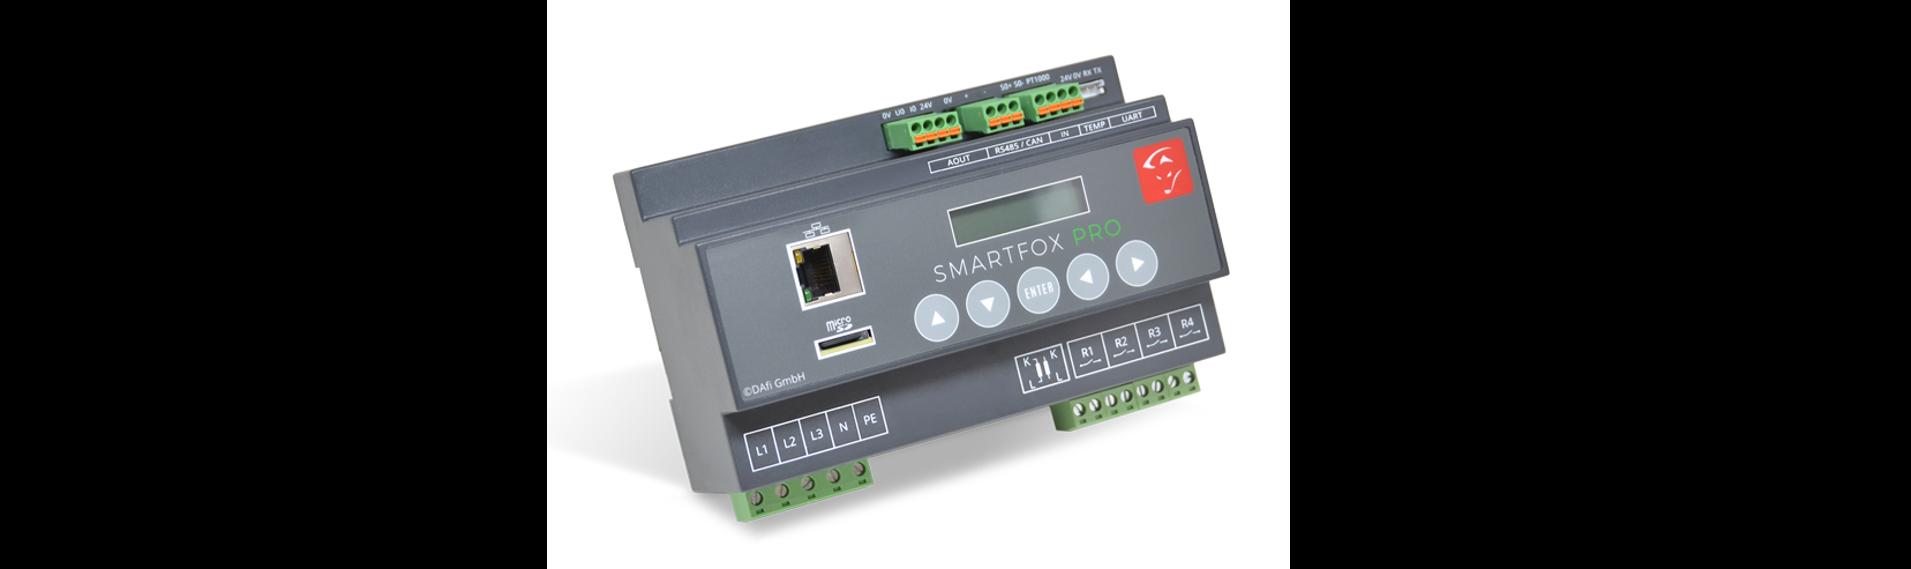 Solar-Energiemanagementsystem SMARTFOX PRO